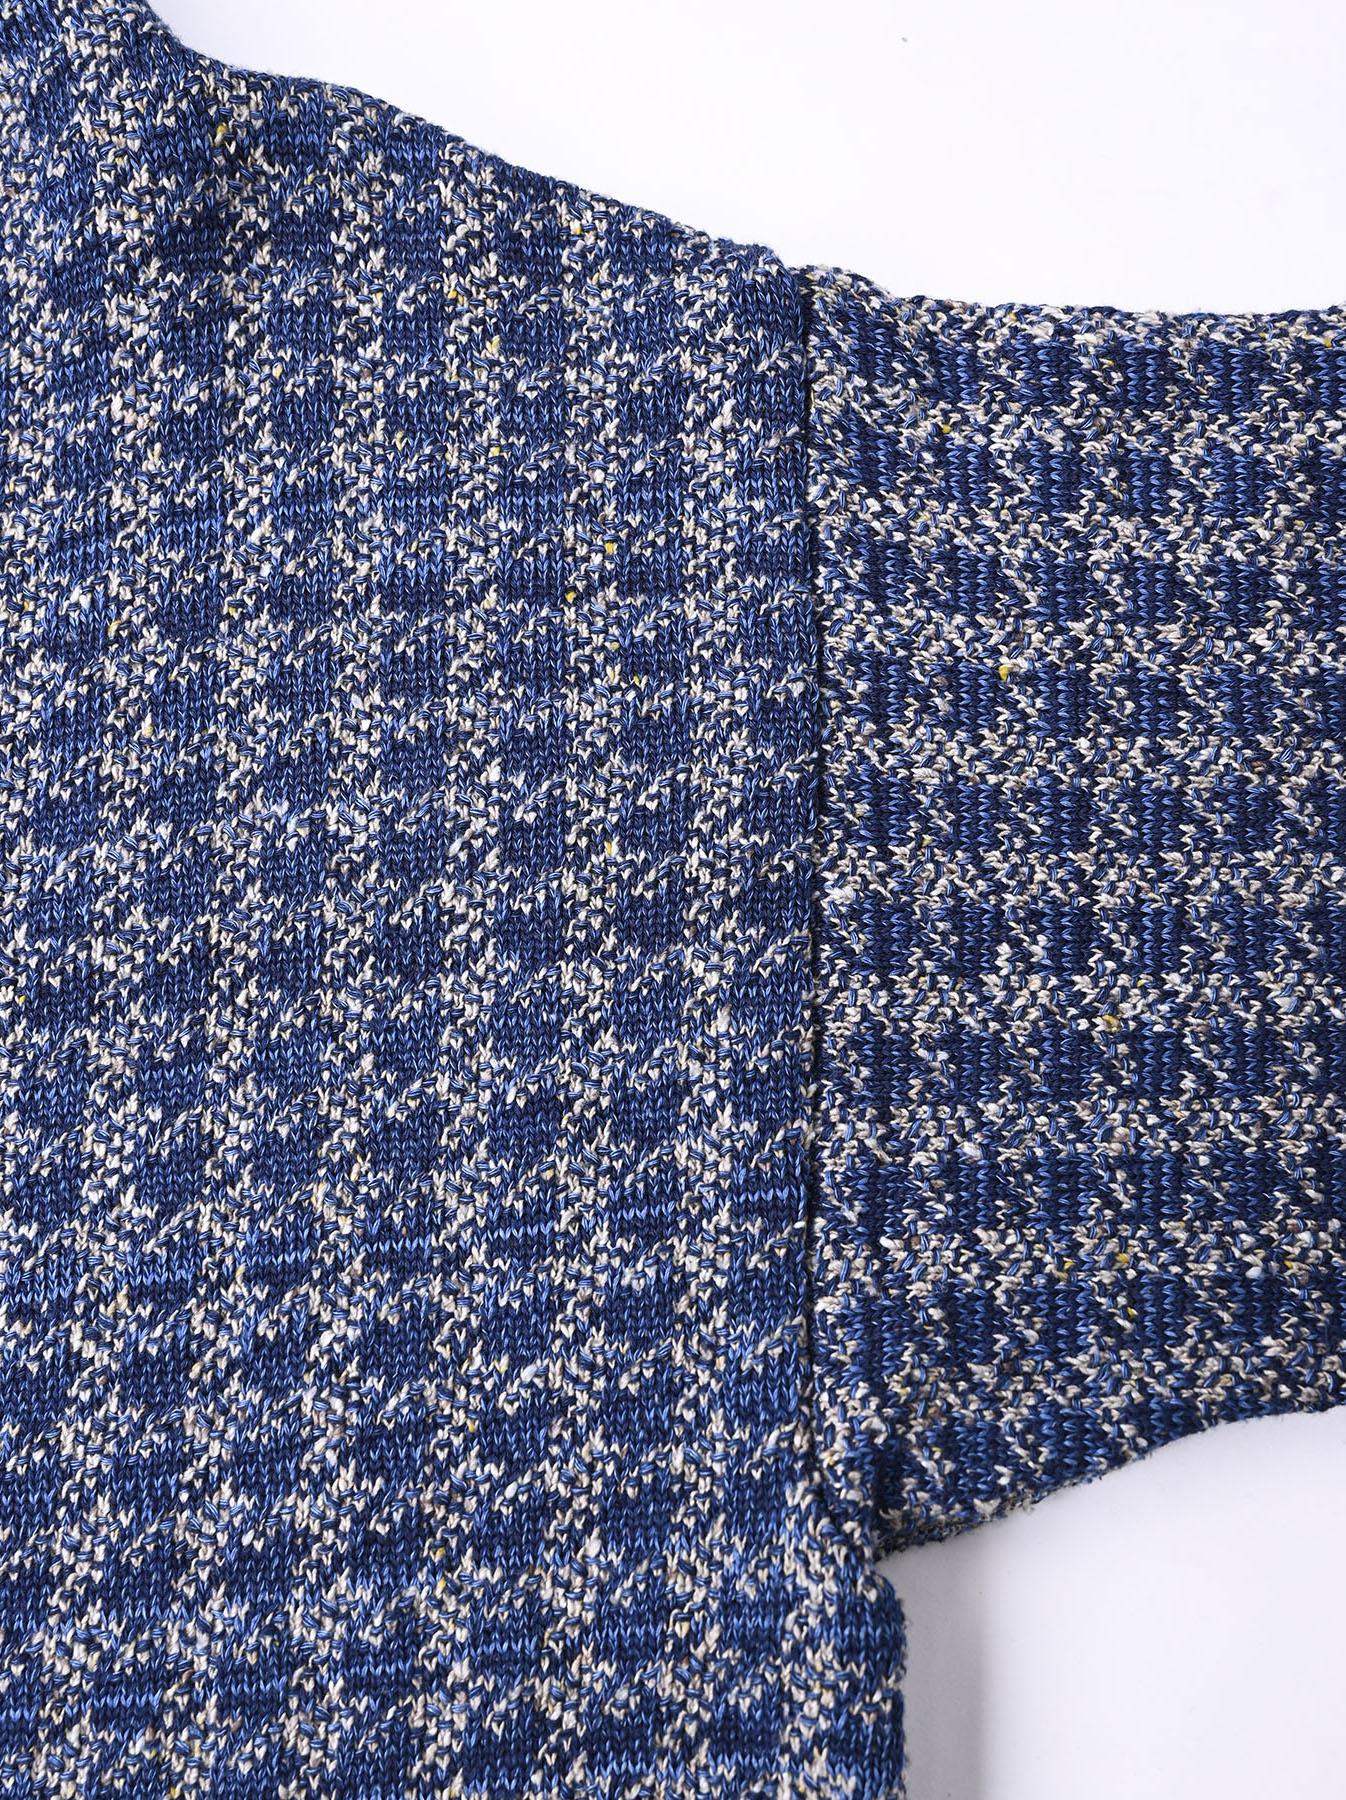 Indigo Knit Jacquard 908 Umahiko Sweater-11